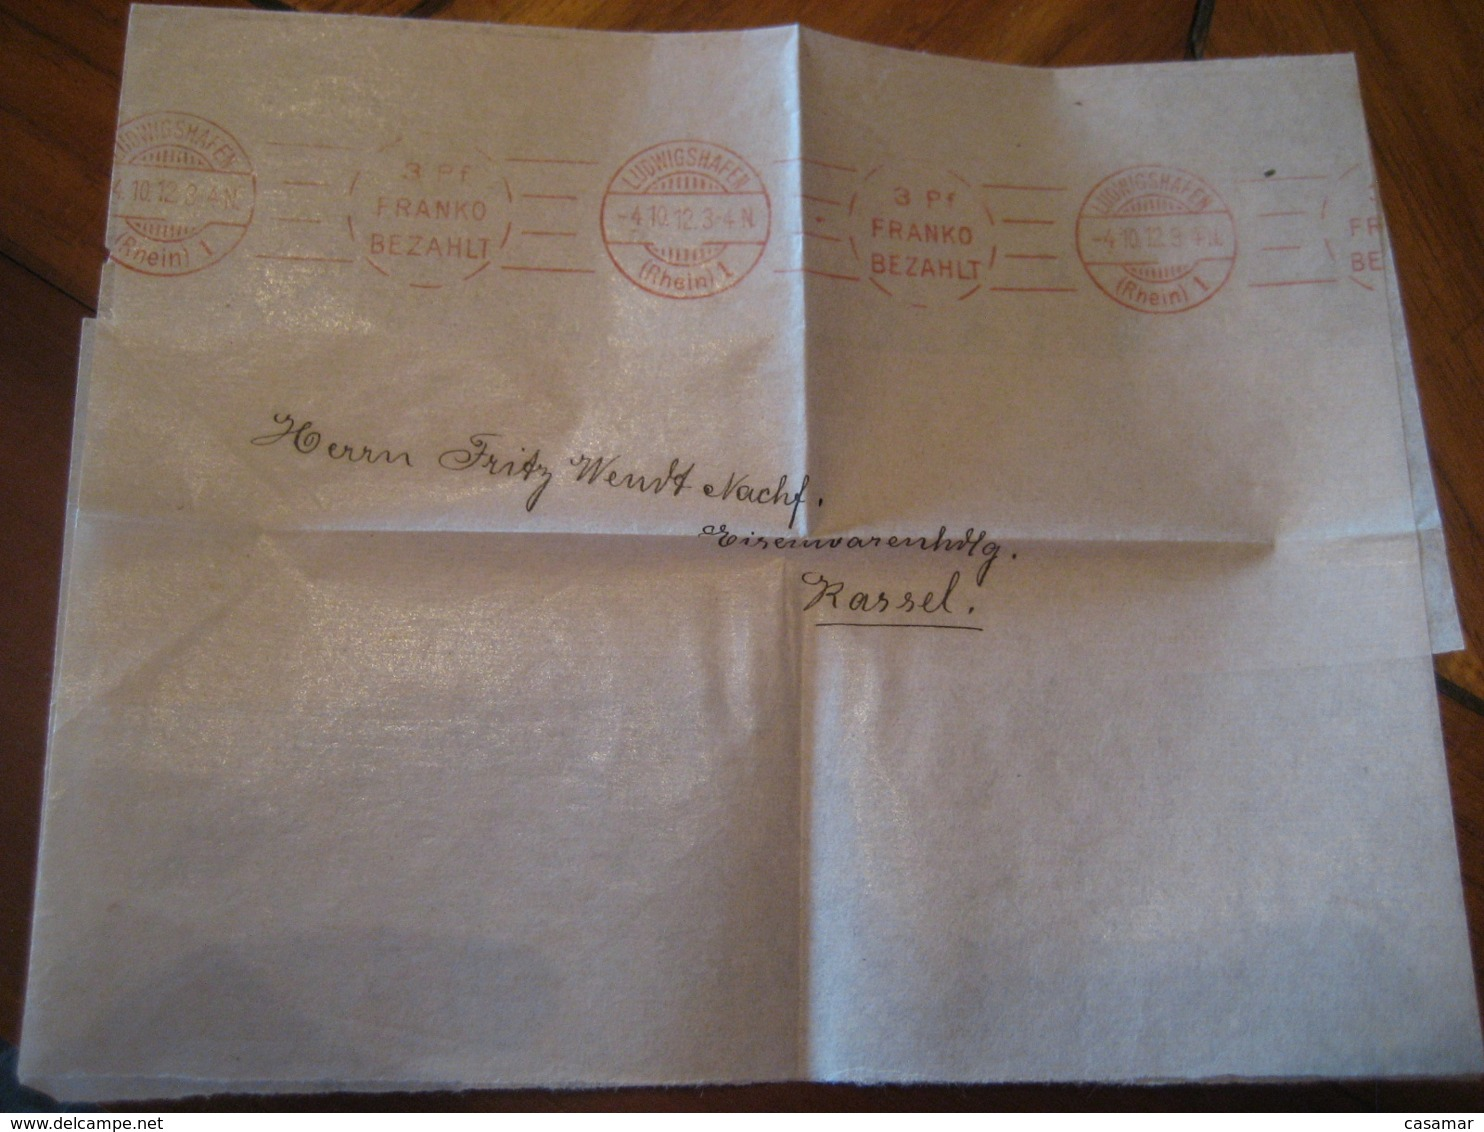 1912 LUDWIGSHAFEN To Kassel 3 Pfennig Meter Mail Cancel Franko Bezahlt Document Frontal Cover GERMANY Empire - Briefe U. Dokumente